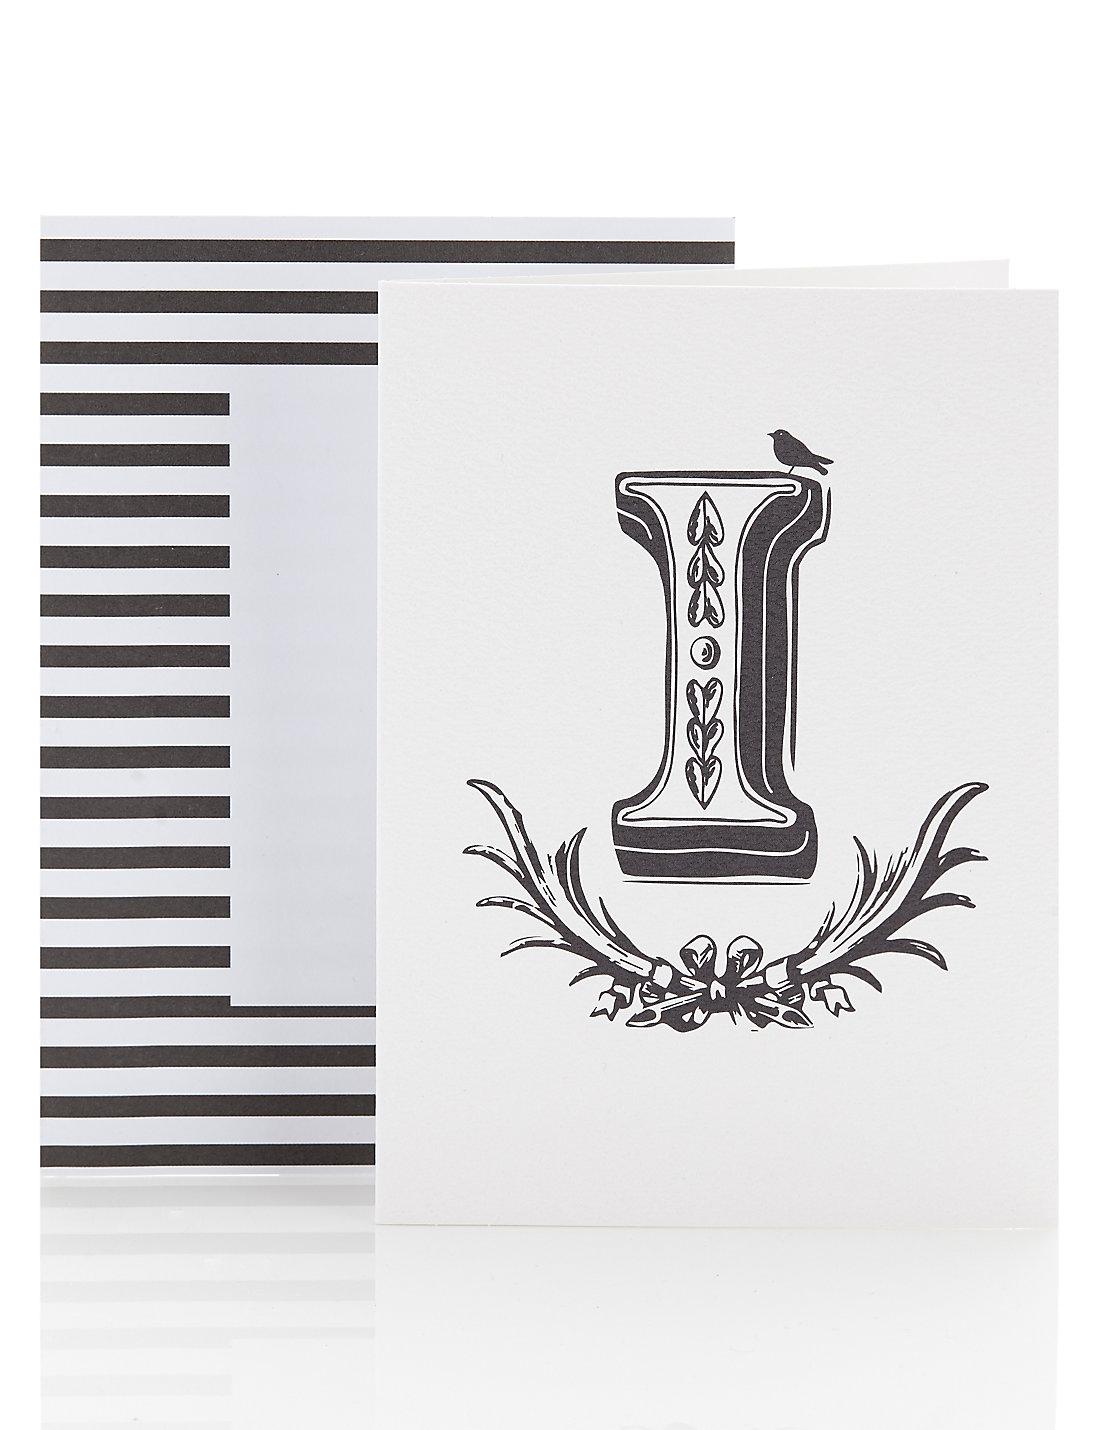 Alphabet greetings card letter i ms alphabet greetings card letter i kristyandbryce Image collections